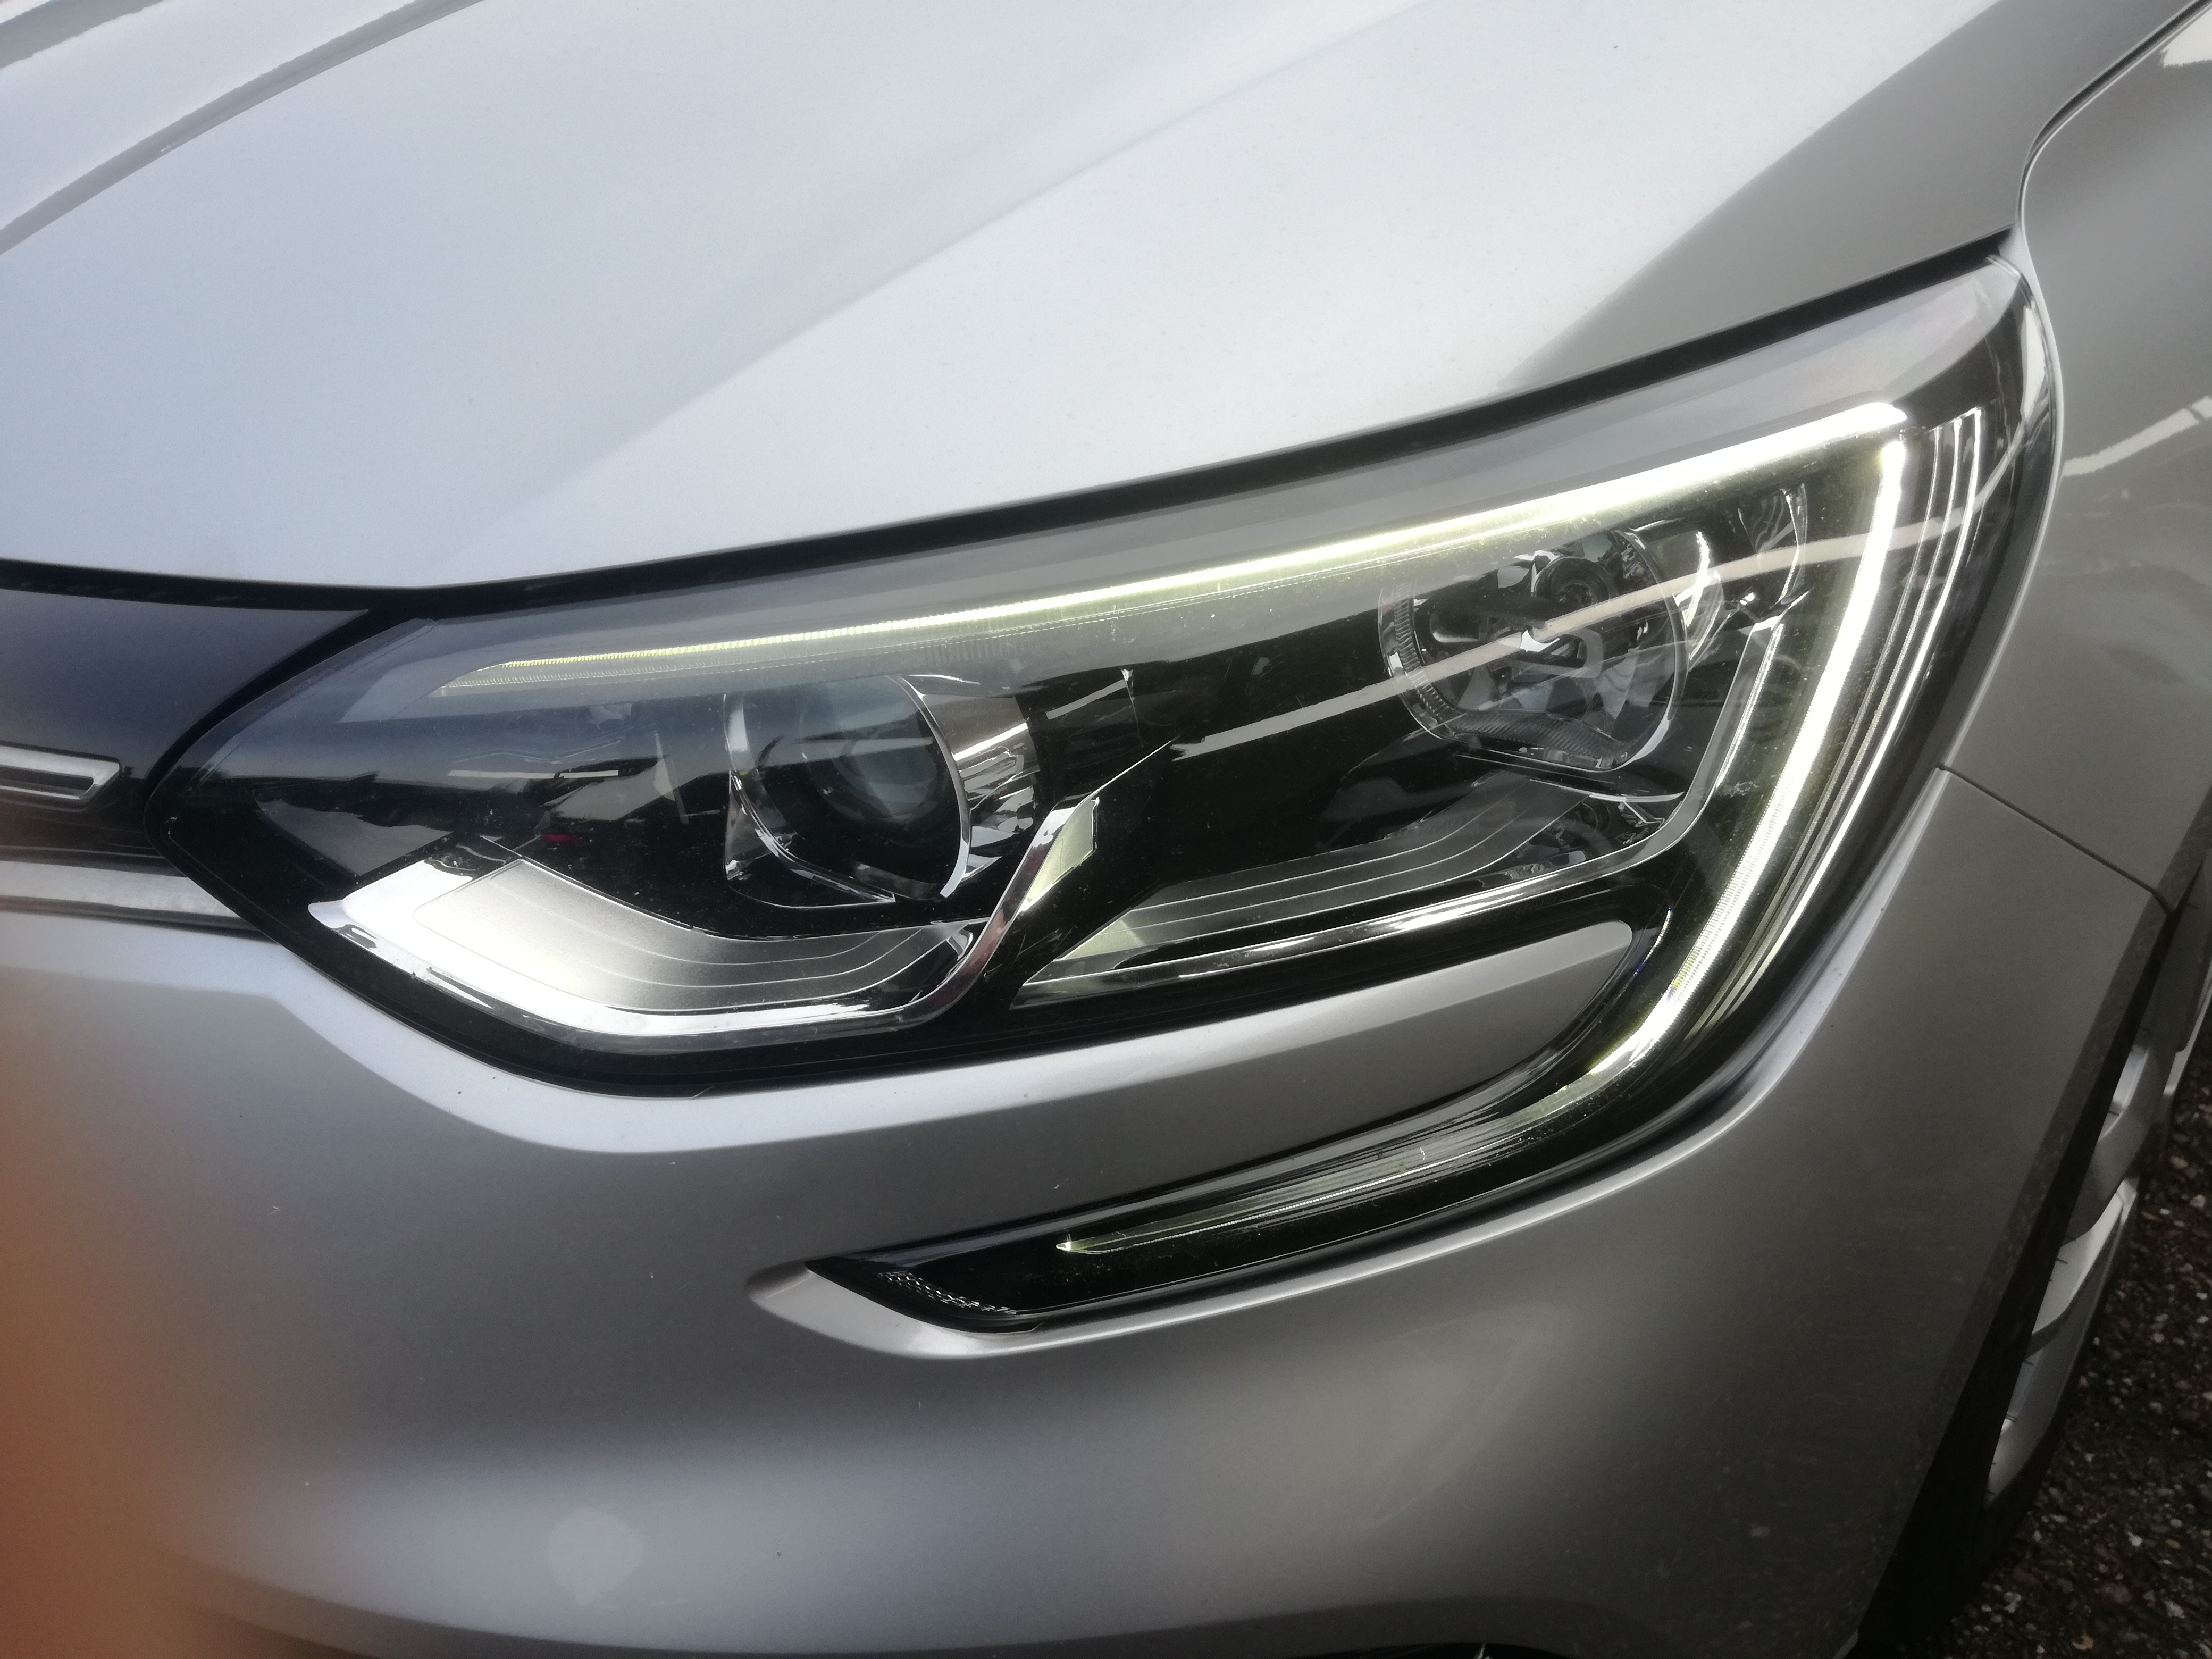 Renault Mégane SPORTS TOURER 1.5 DCI 110cv | Imagem 15